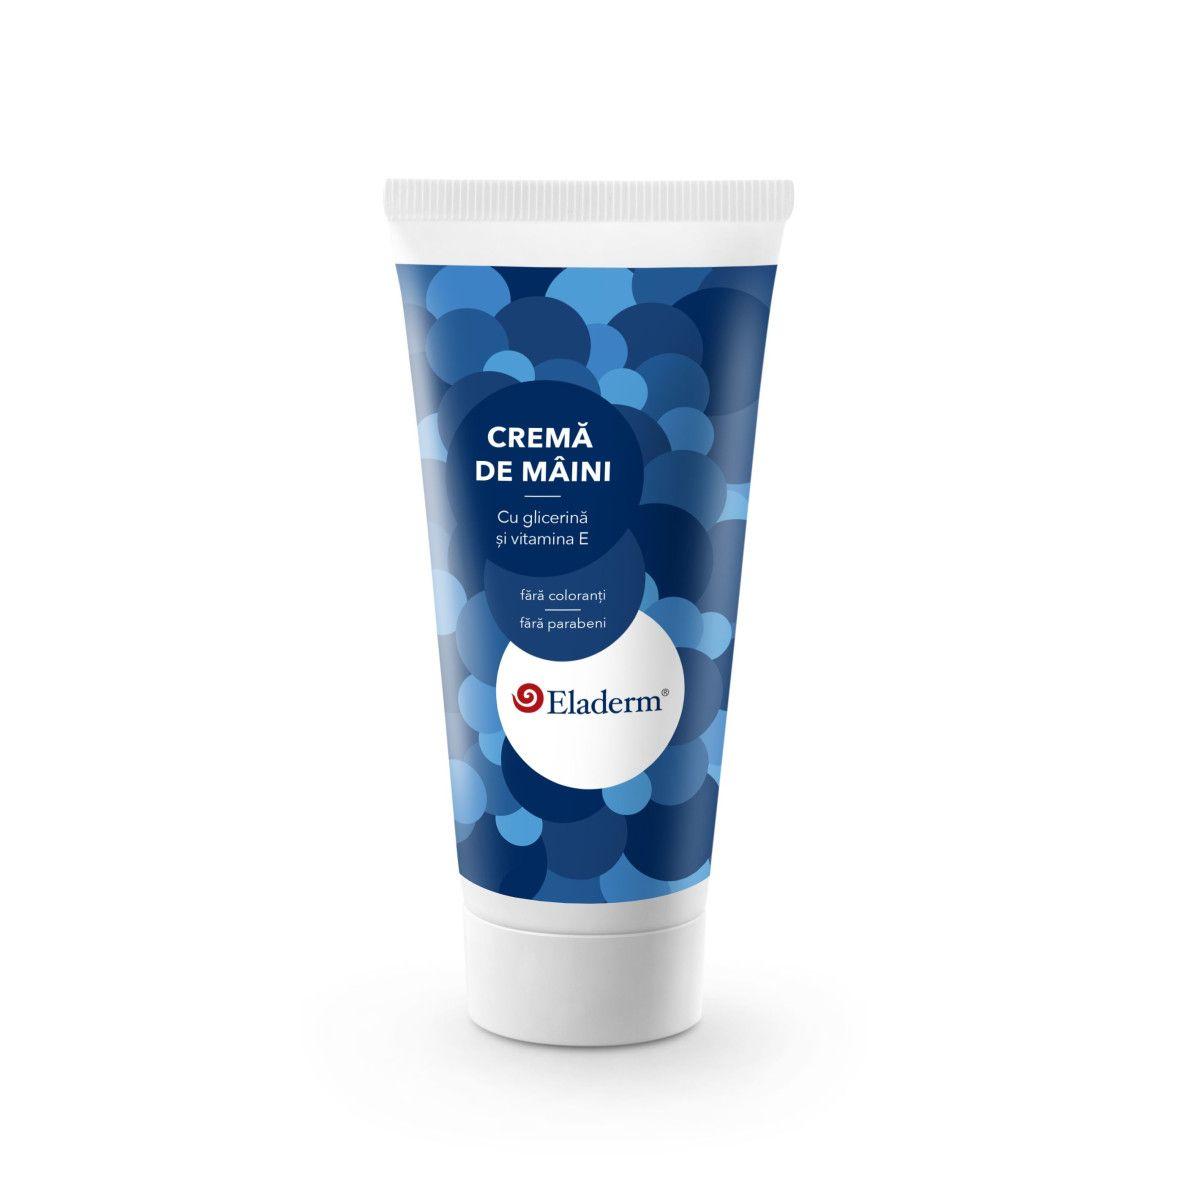 Crema de maini cu glicerina si vitamina e - 100 ml